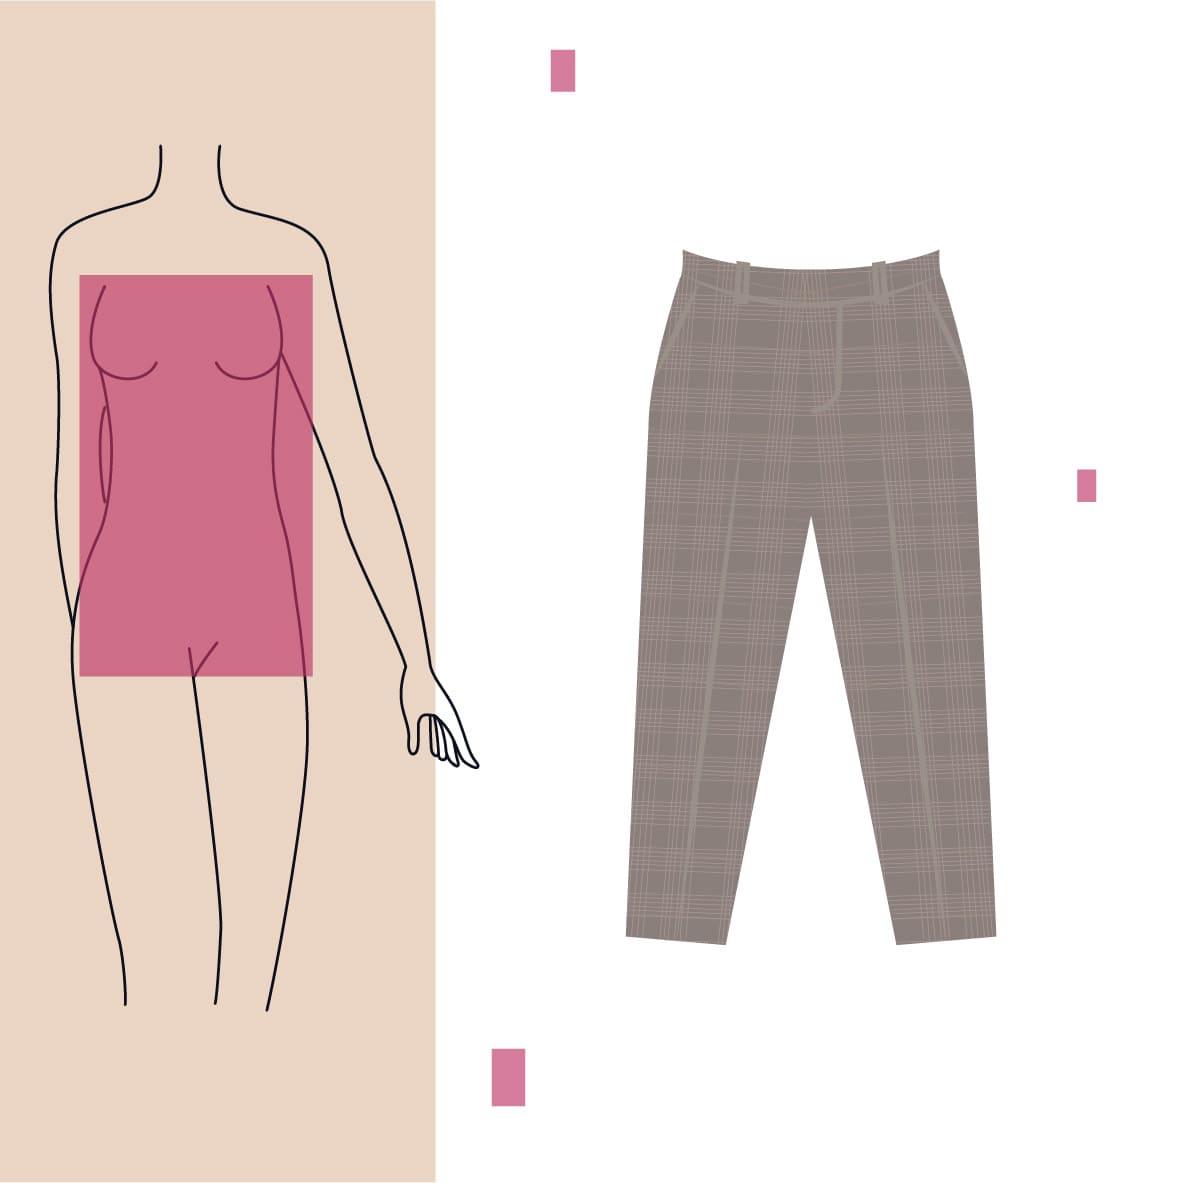 pantalon chino para cuerpo rectangular